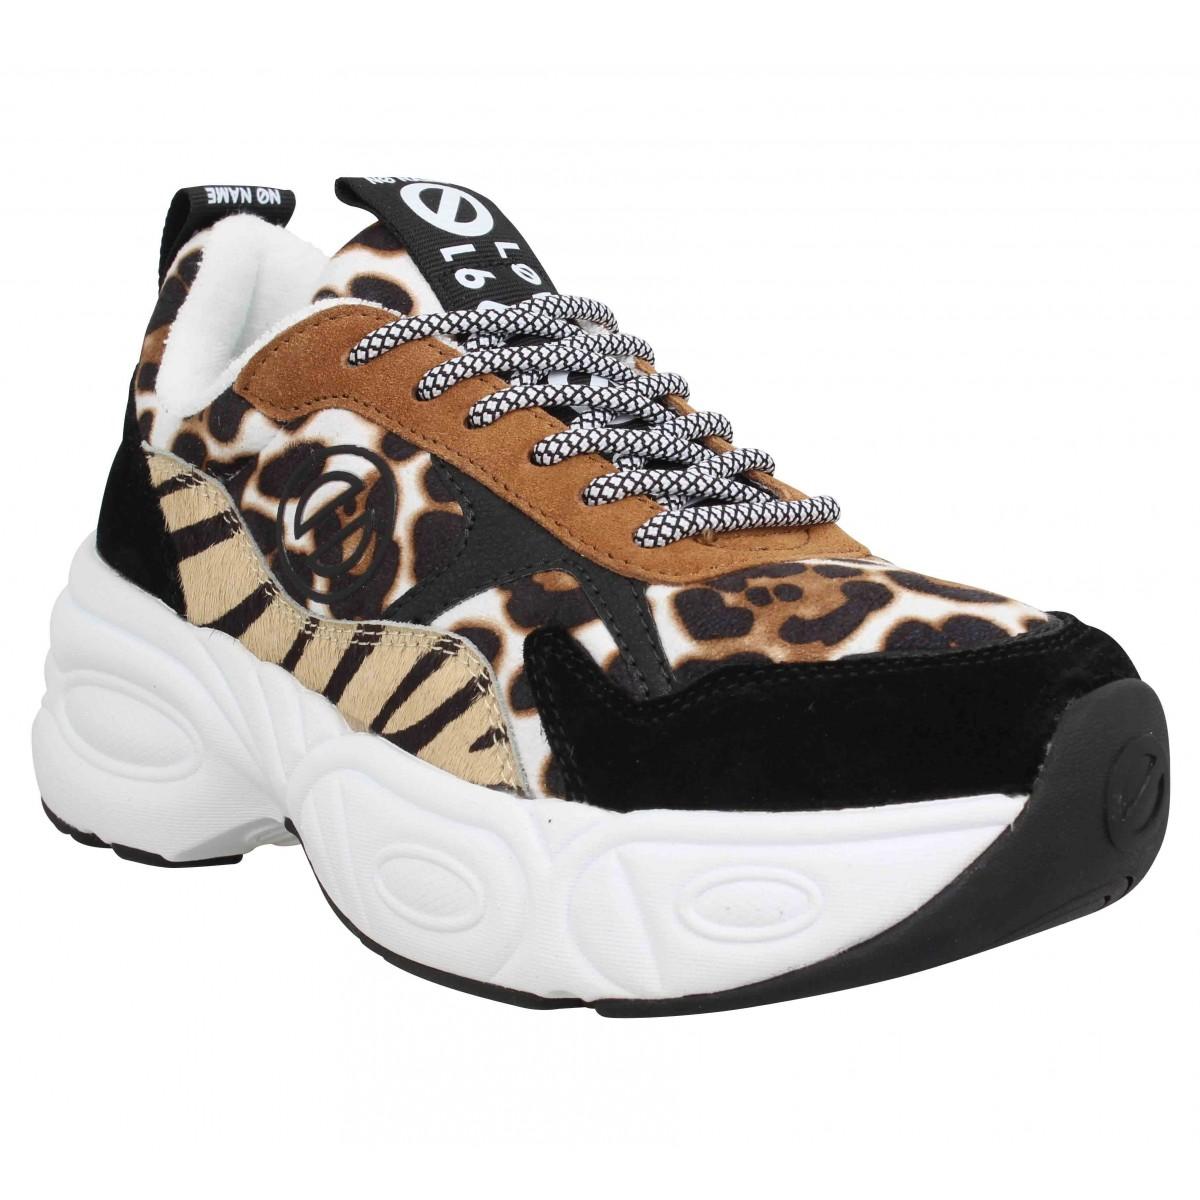 Baskets NO NAME Nitro Jogger cow suede Femme Leopard